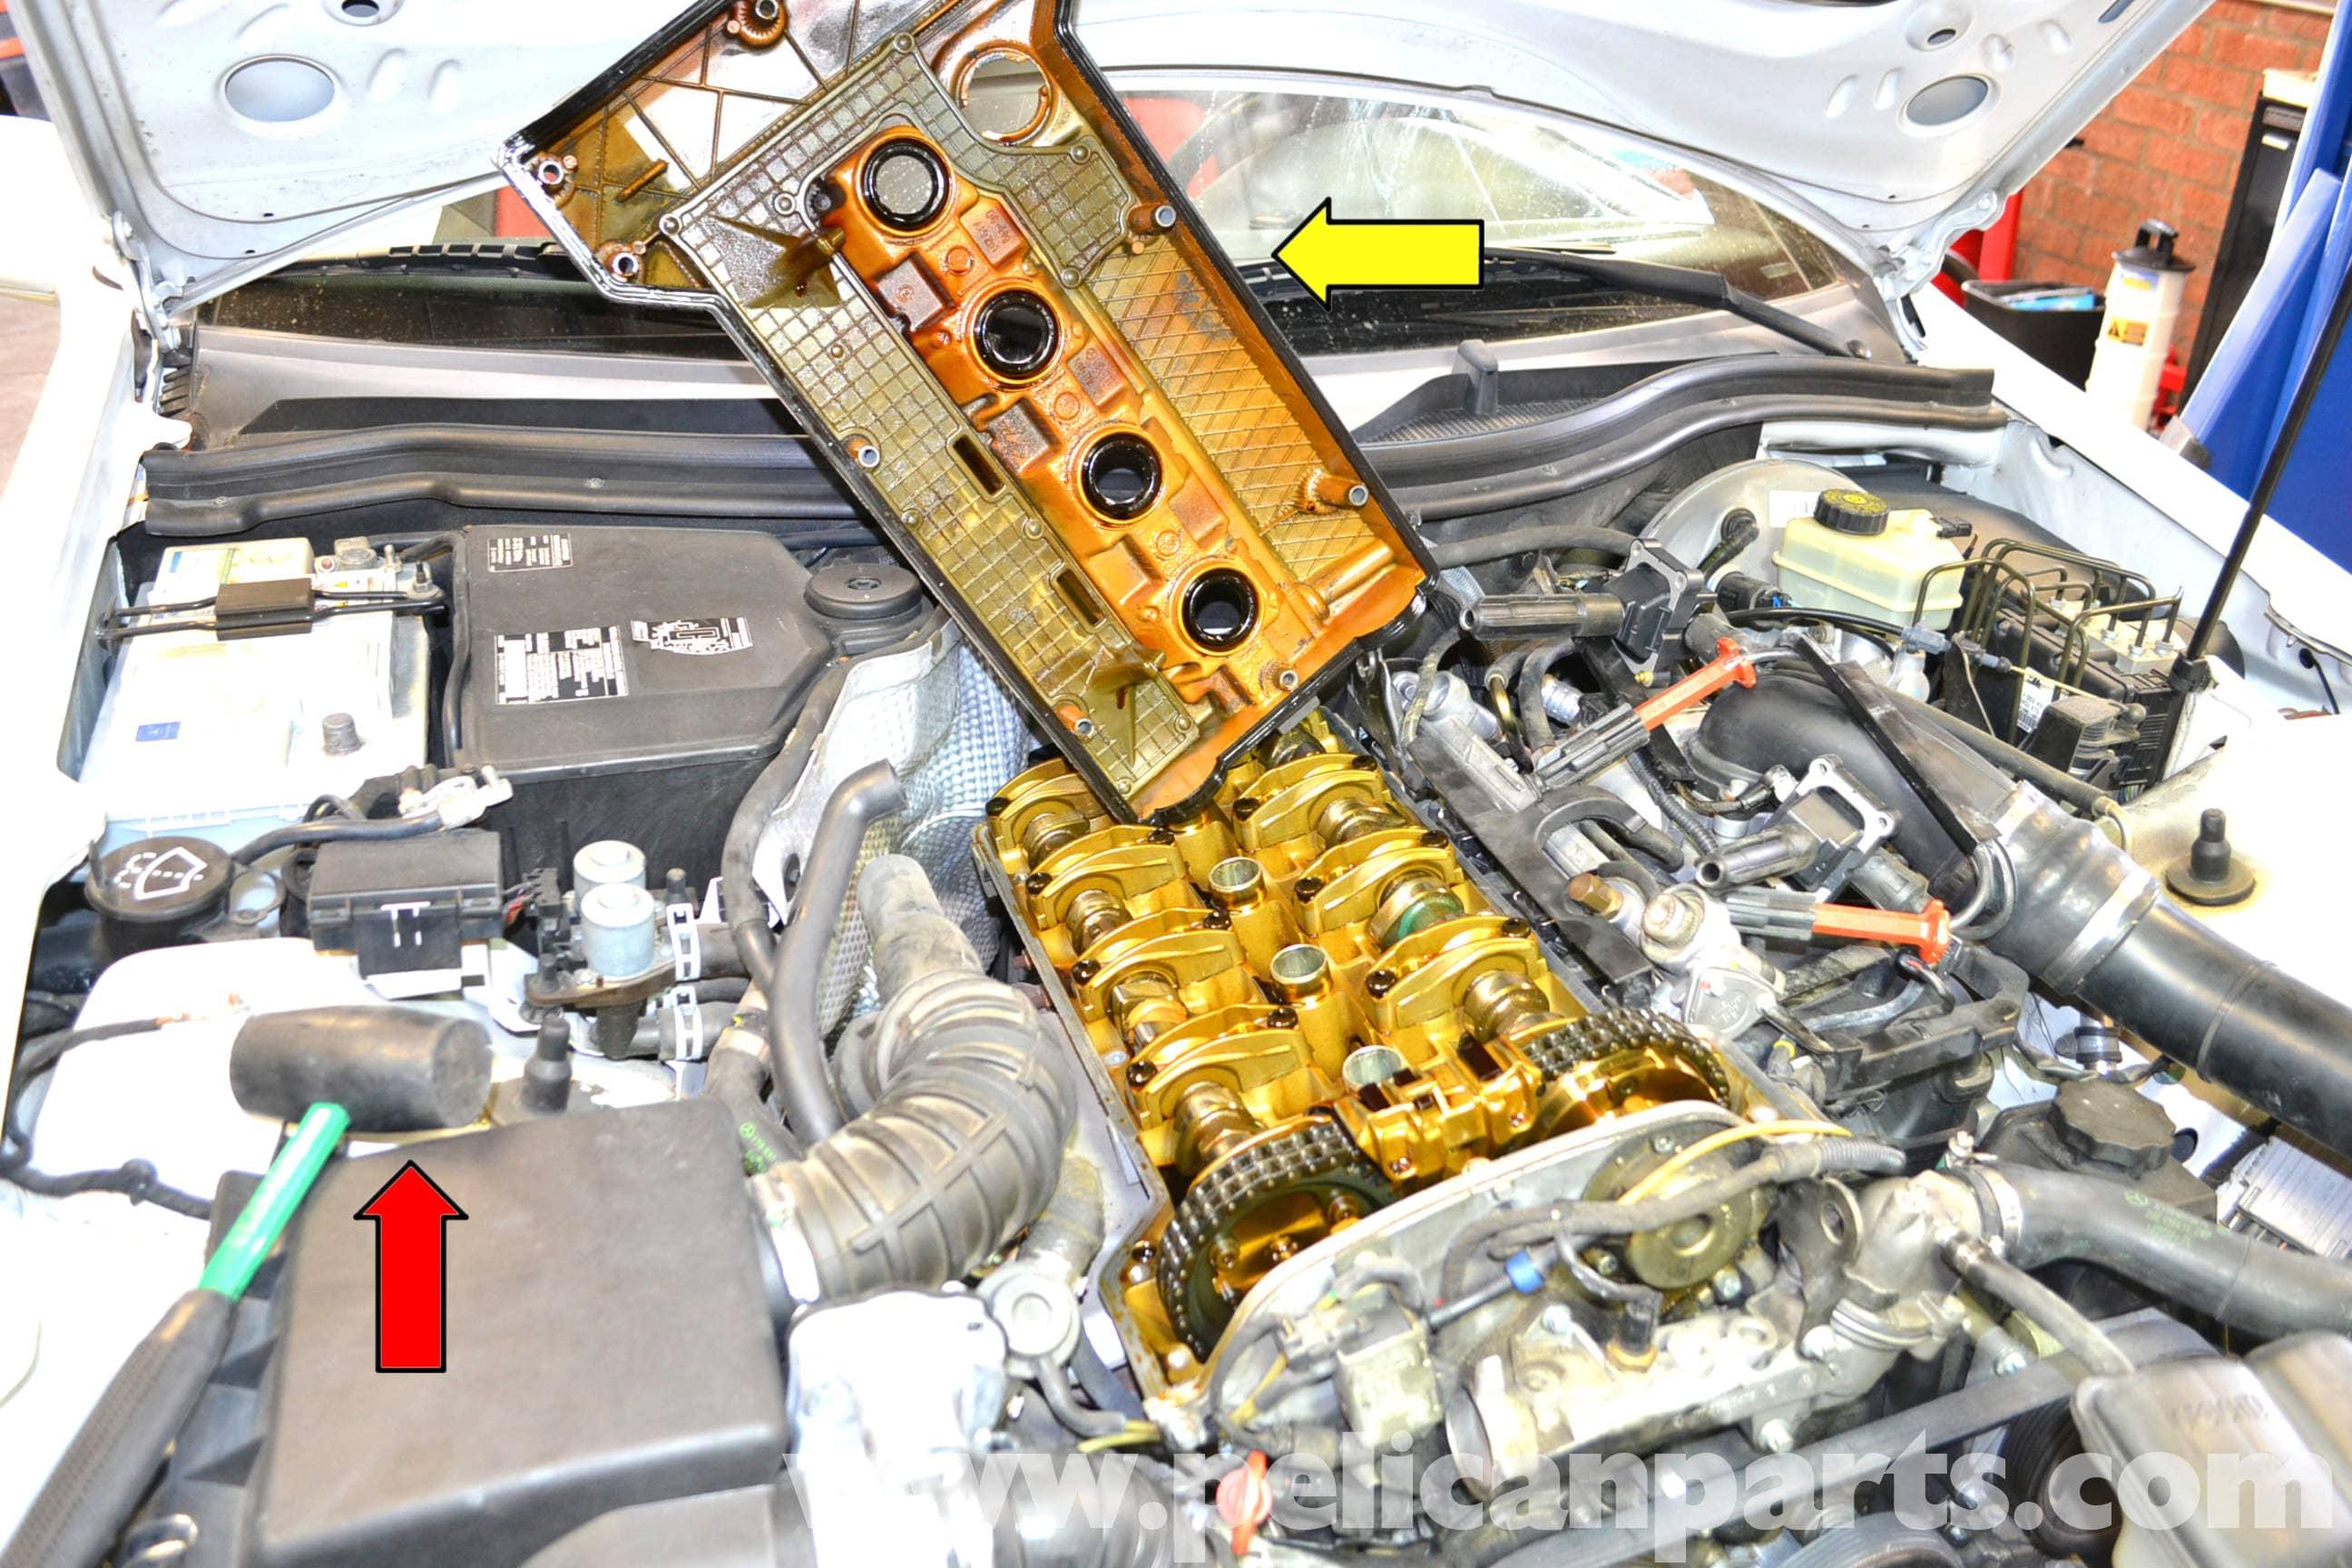 mercedes slk 230 valve cover gasket replacement 1998 2004 pelican parts diy maintenance